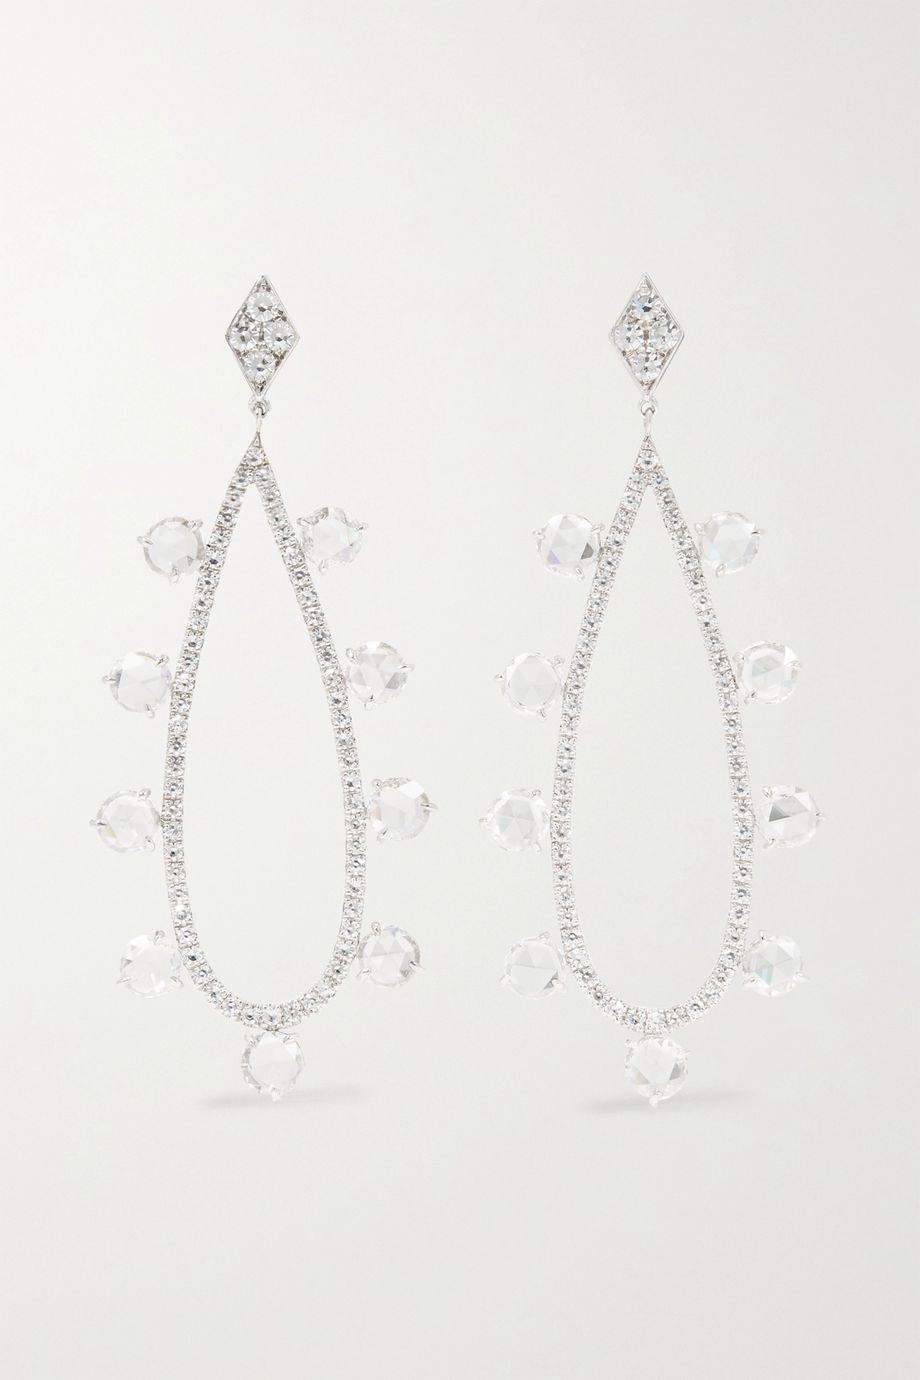 Martin Katz 18-karat white gold diamond earrings